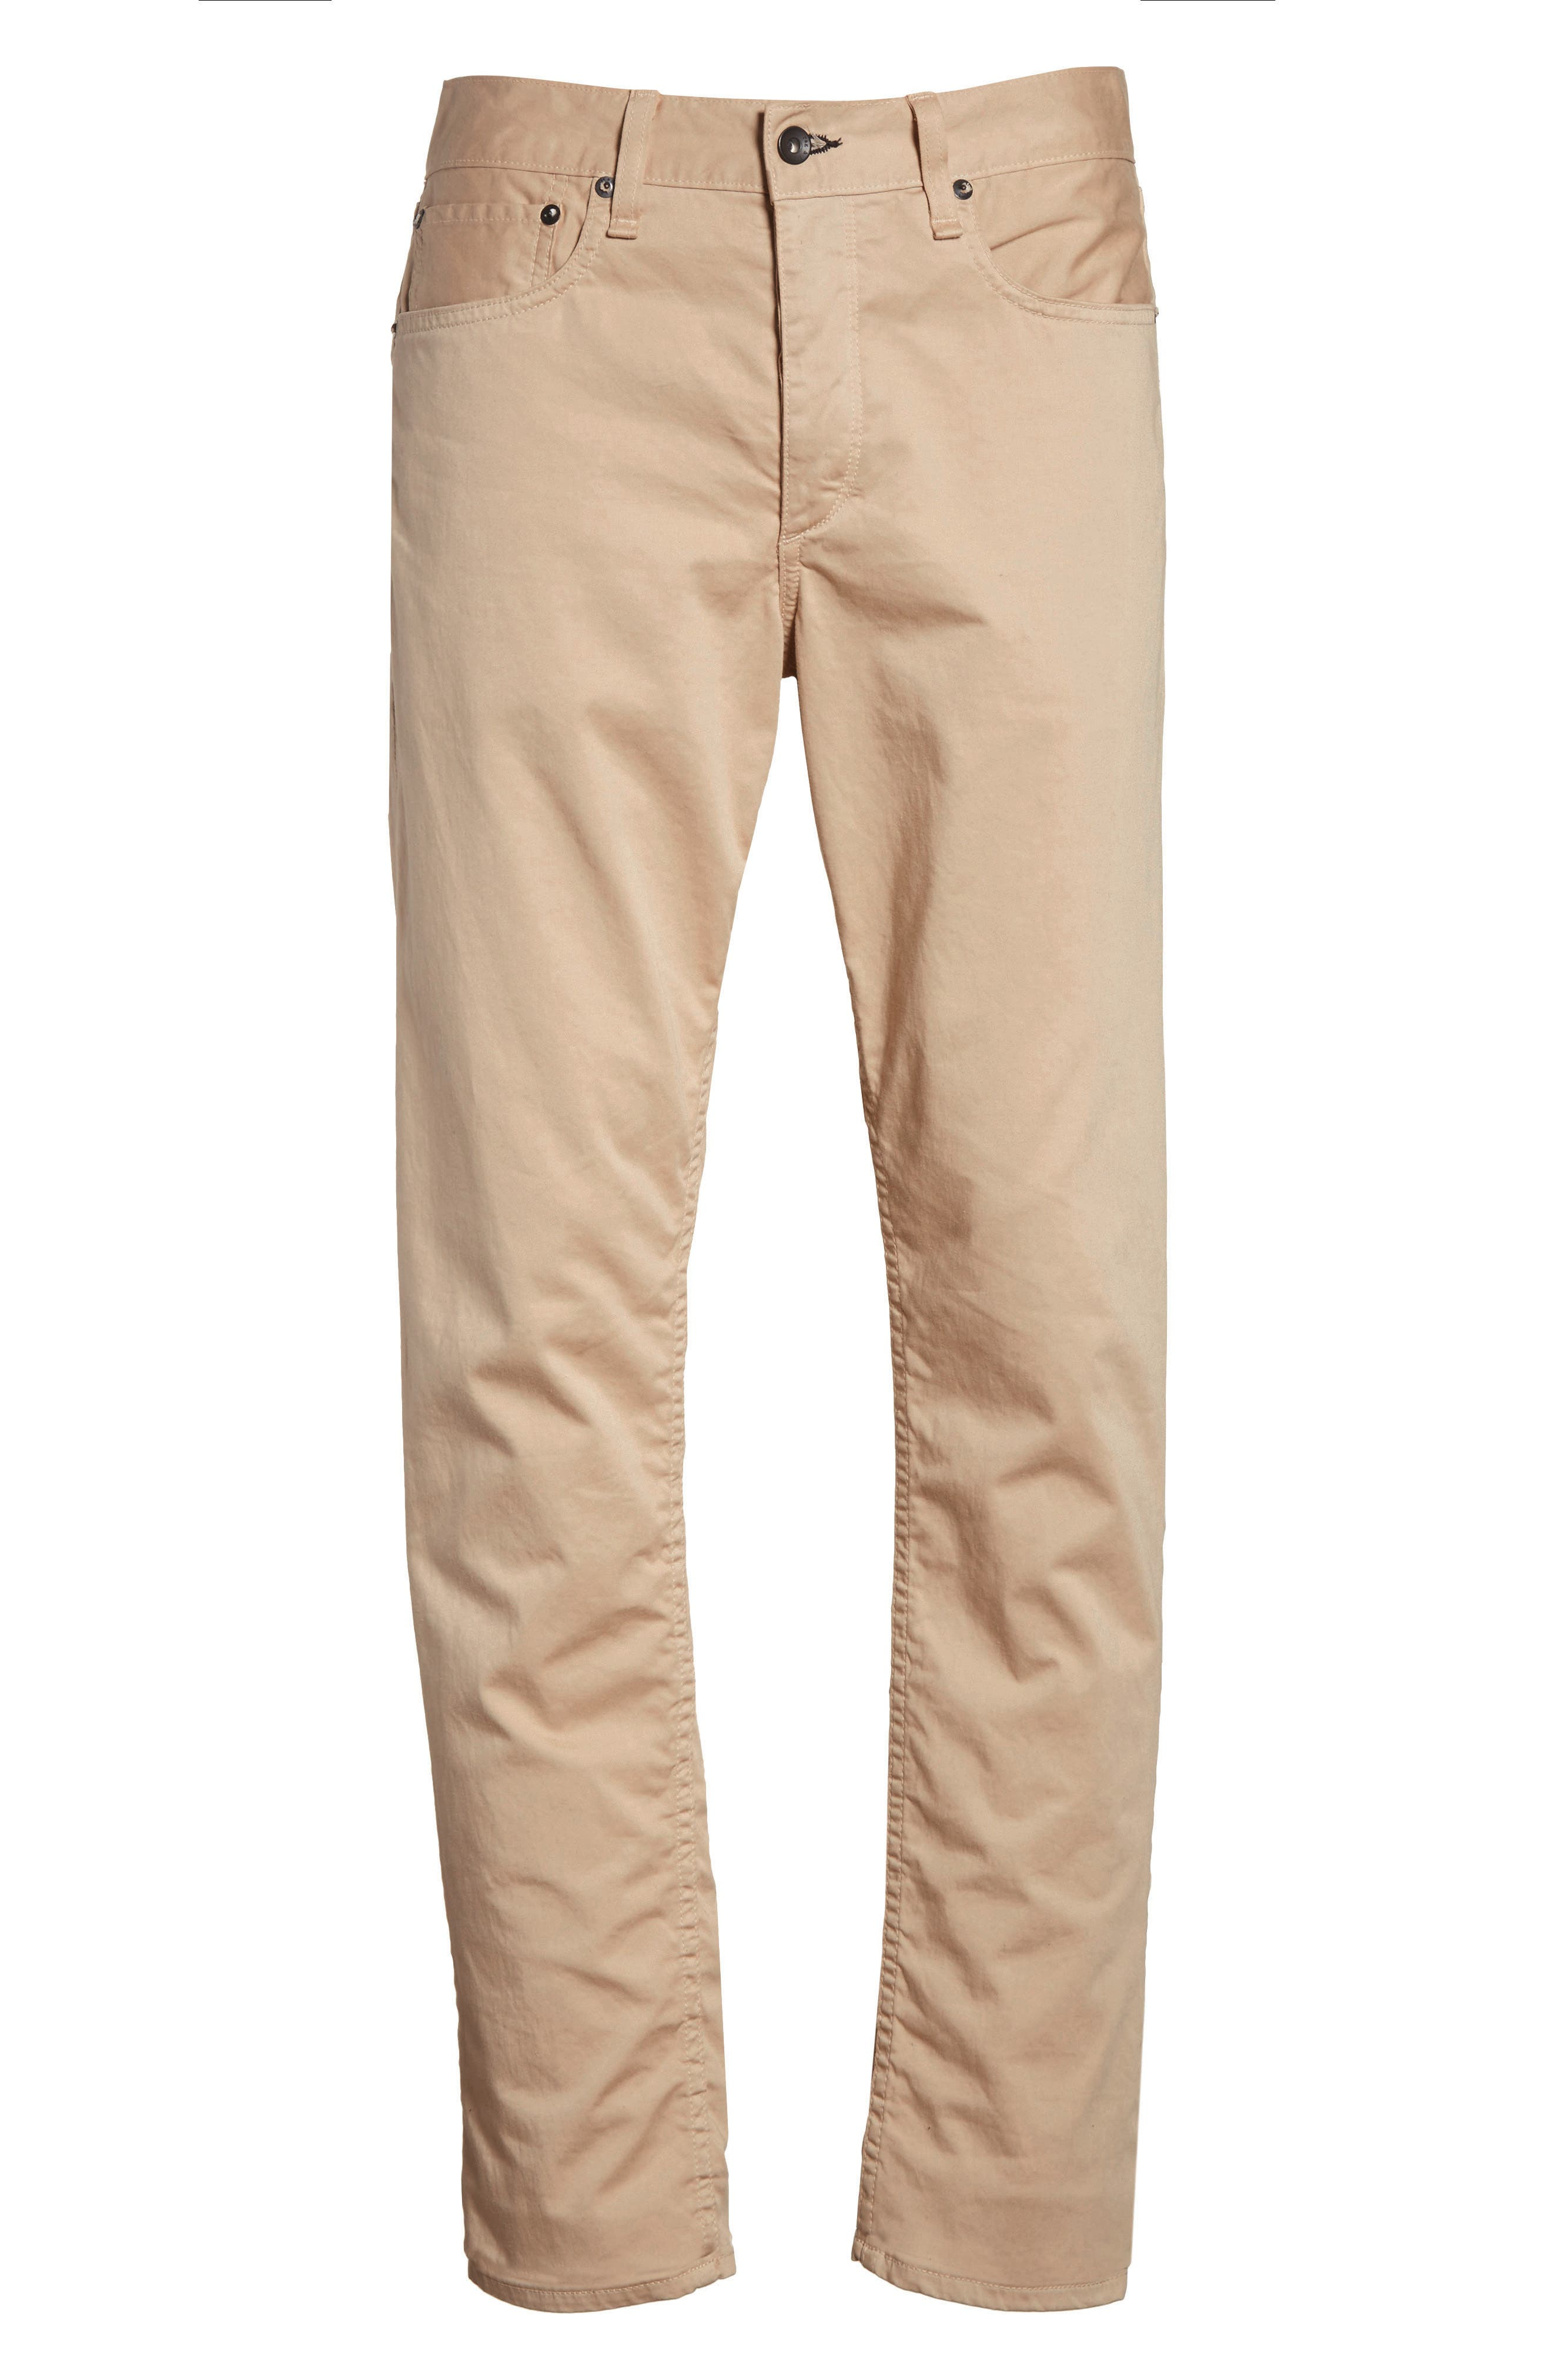 Fit 2 Five-Pocket Twill Pants,                             Alternate thumbnail 6, color,                             250